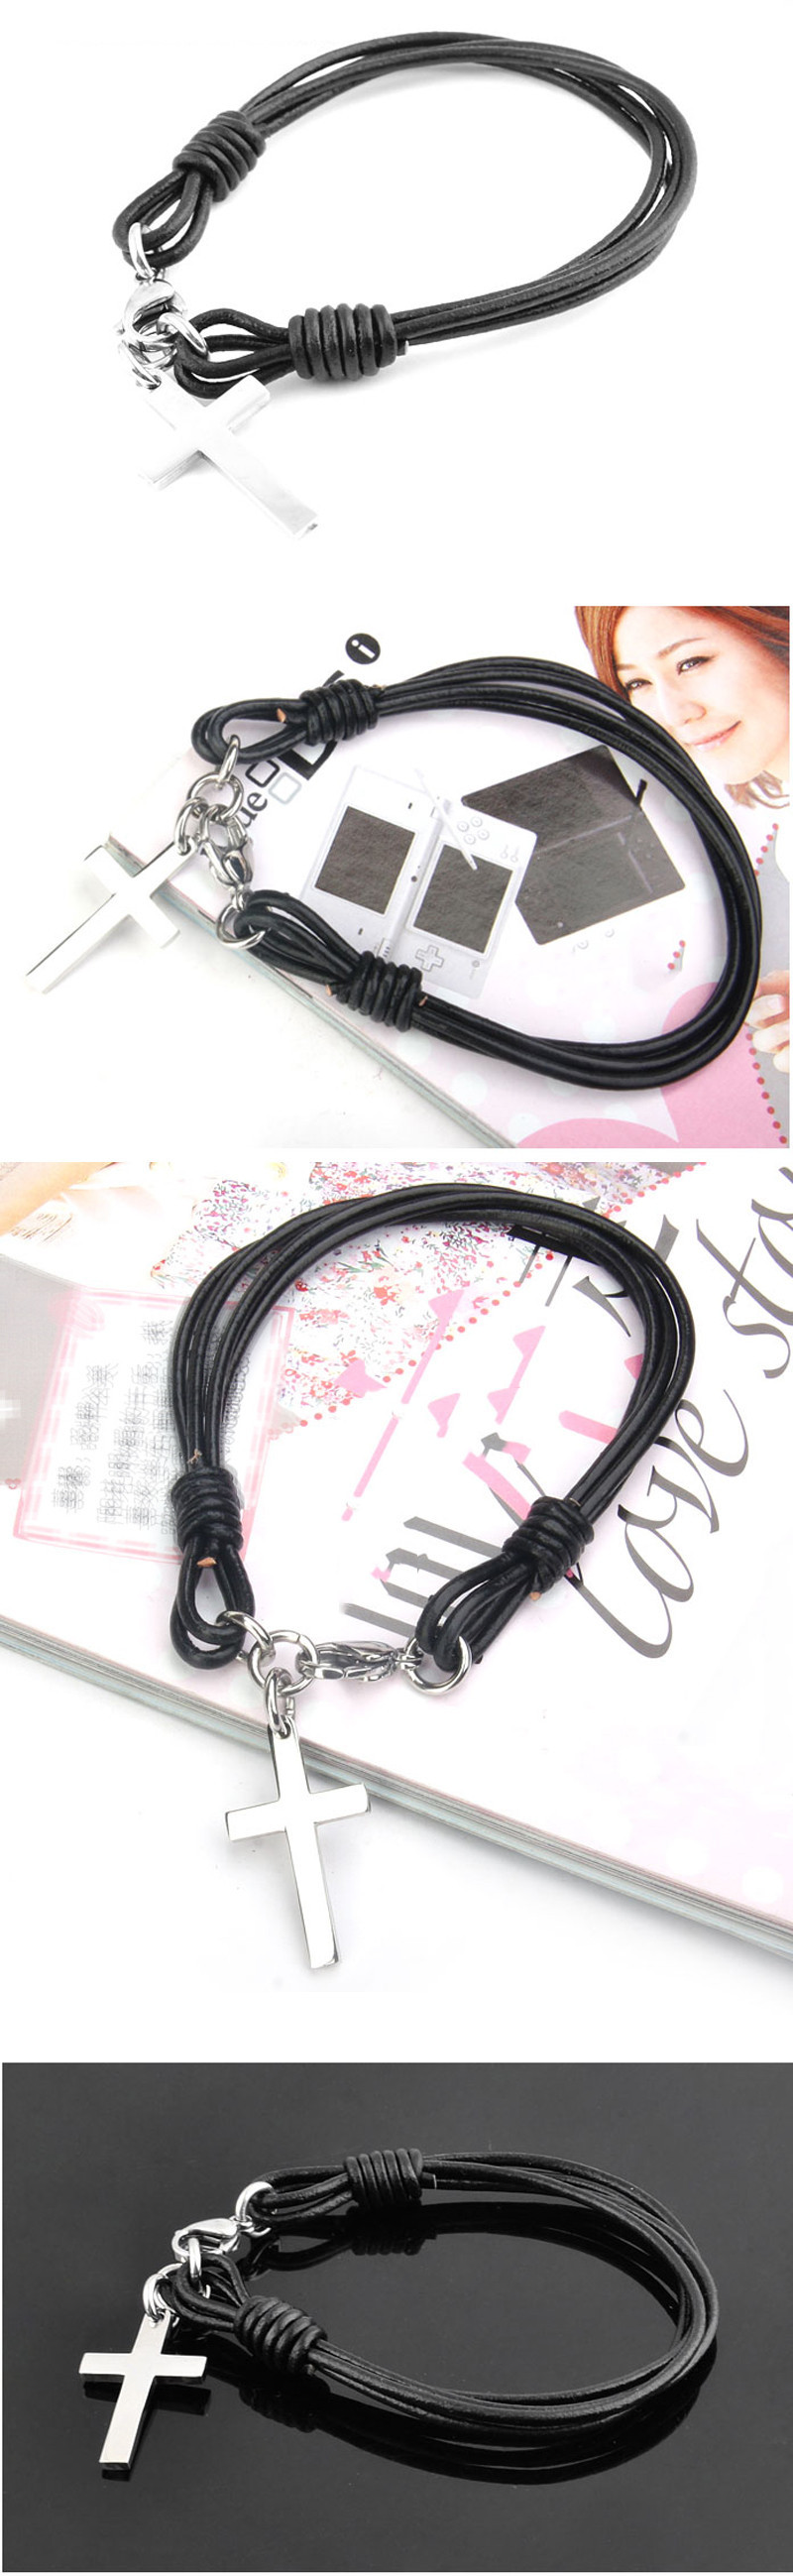 Браслет-цепь Chinesoon  BH-111039